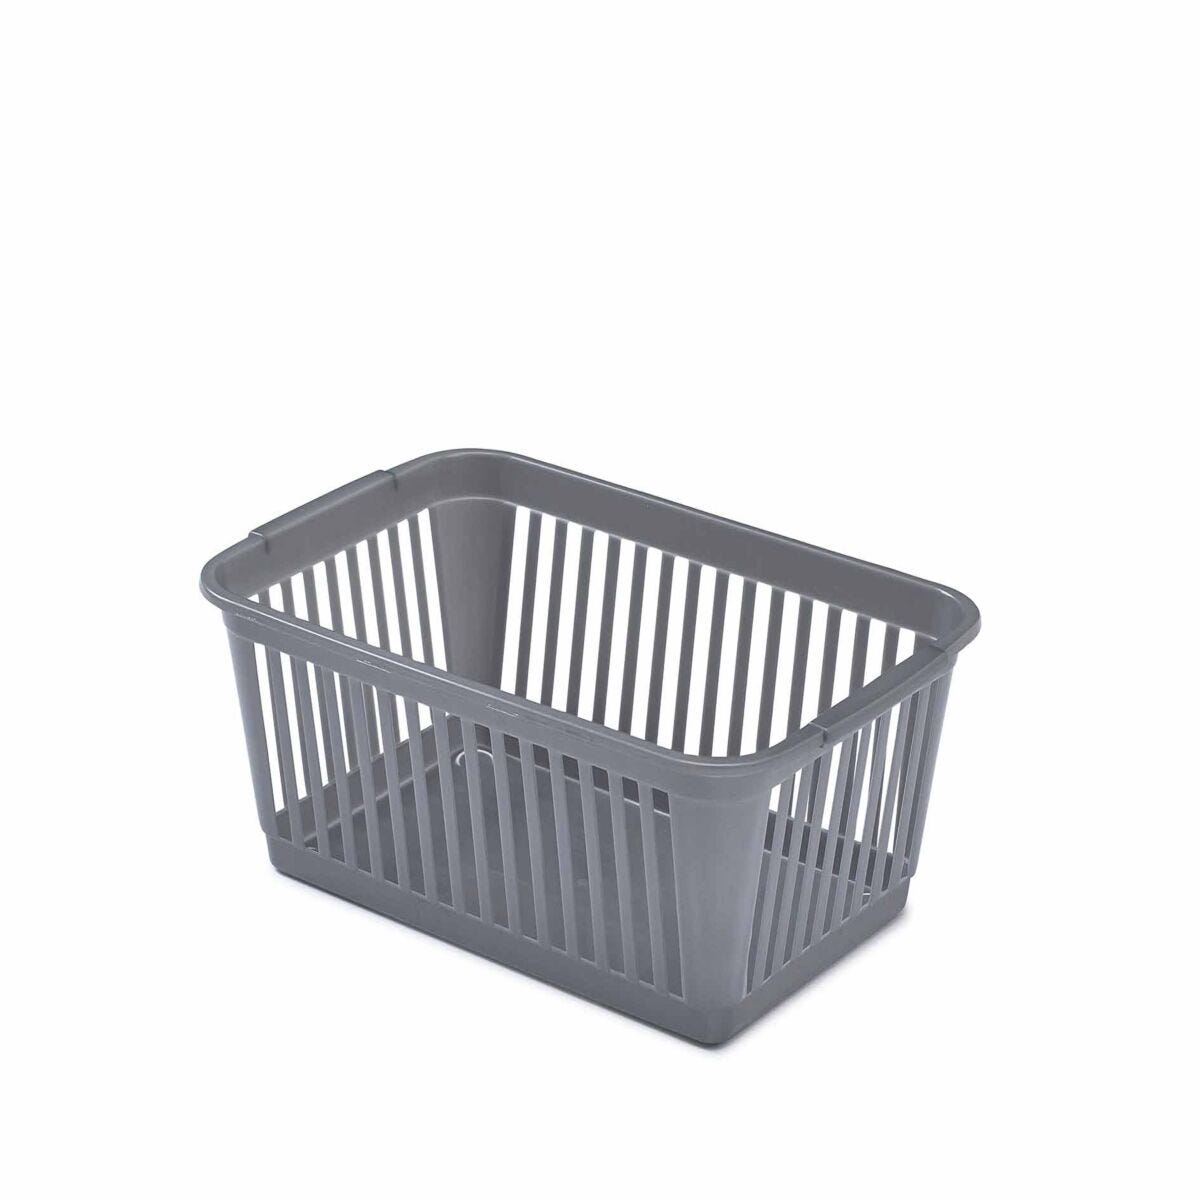 Whitefurze Handy Basket 30cm Pack of 12